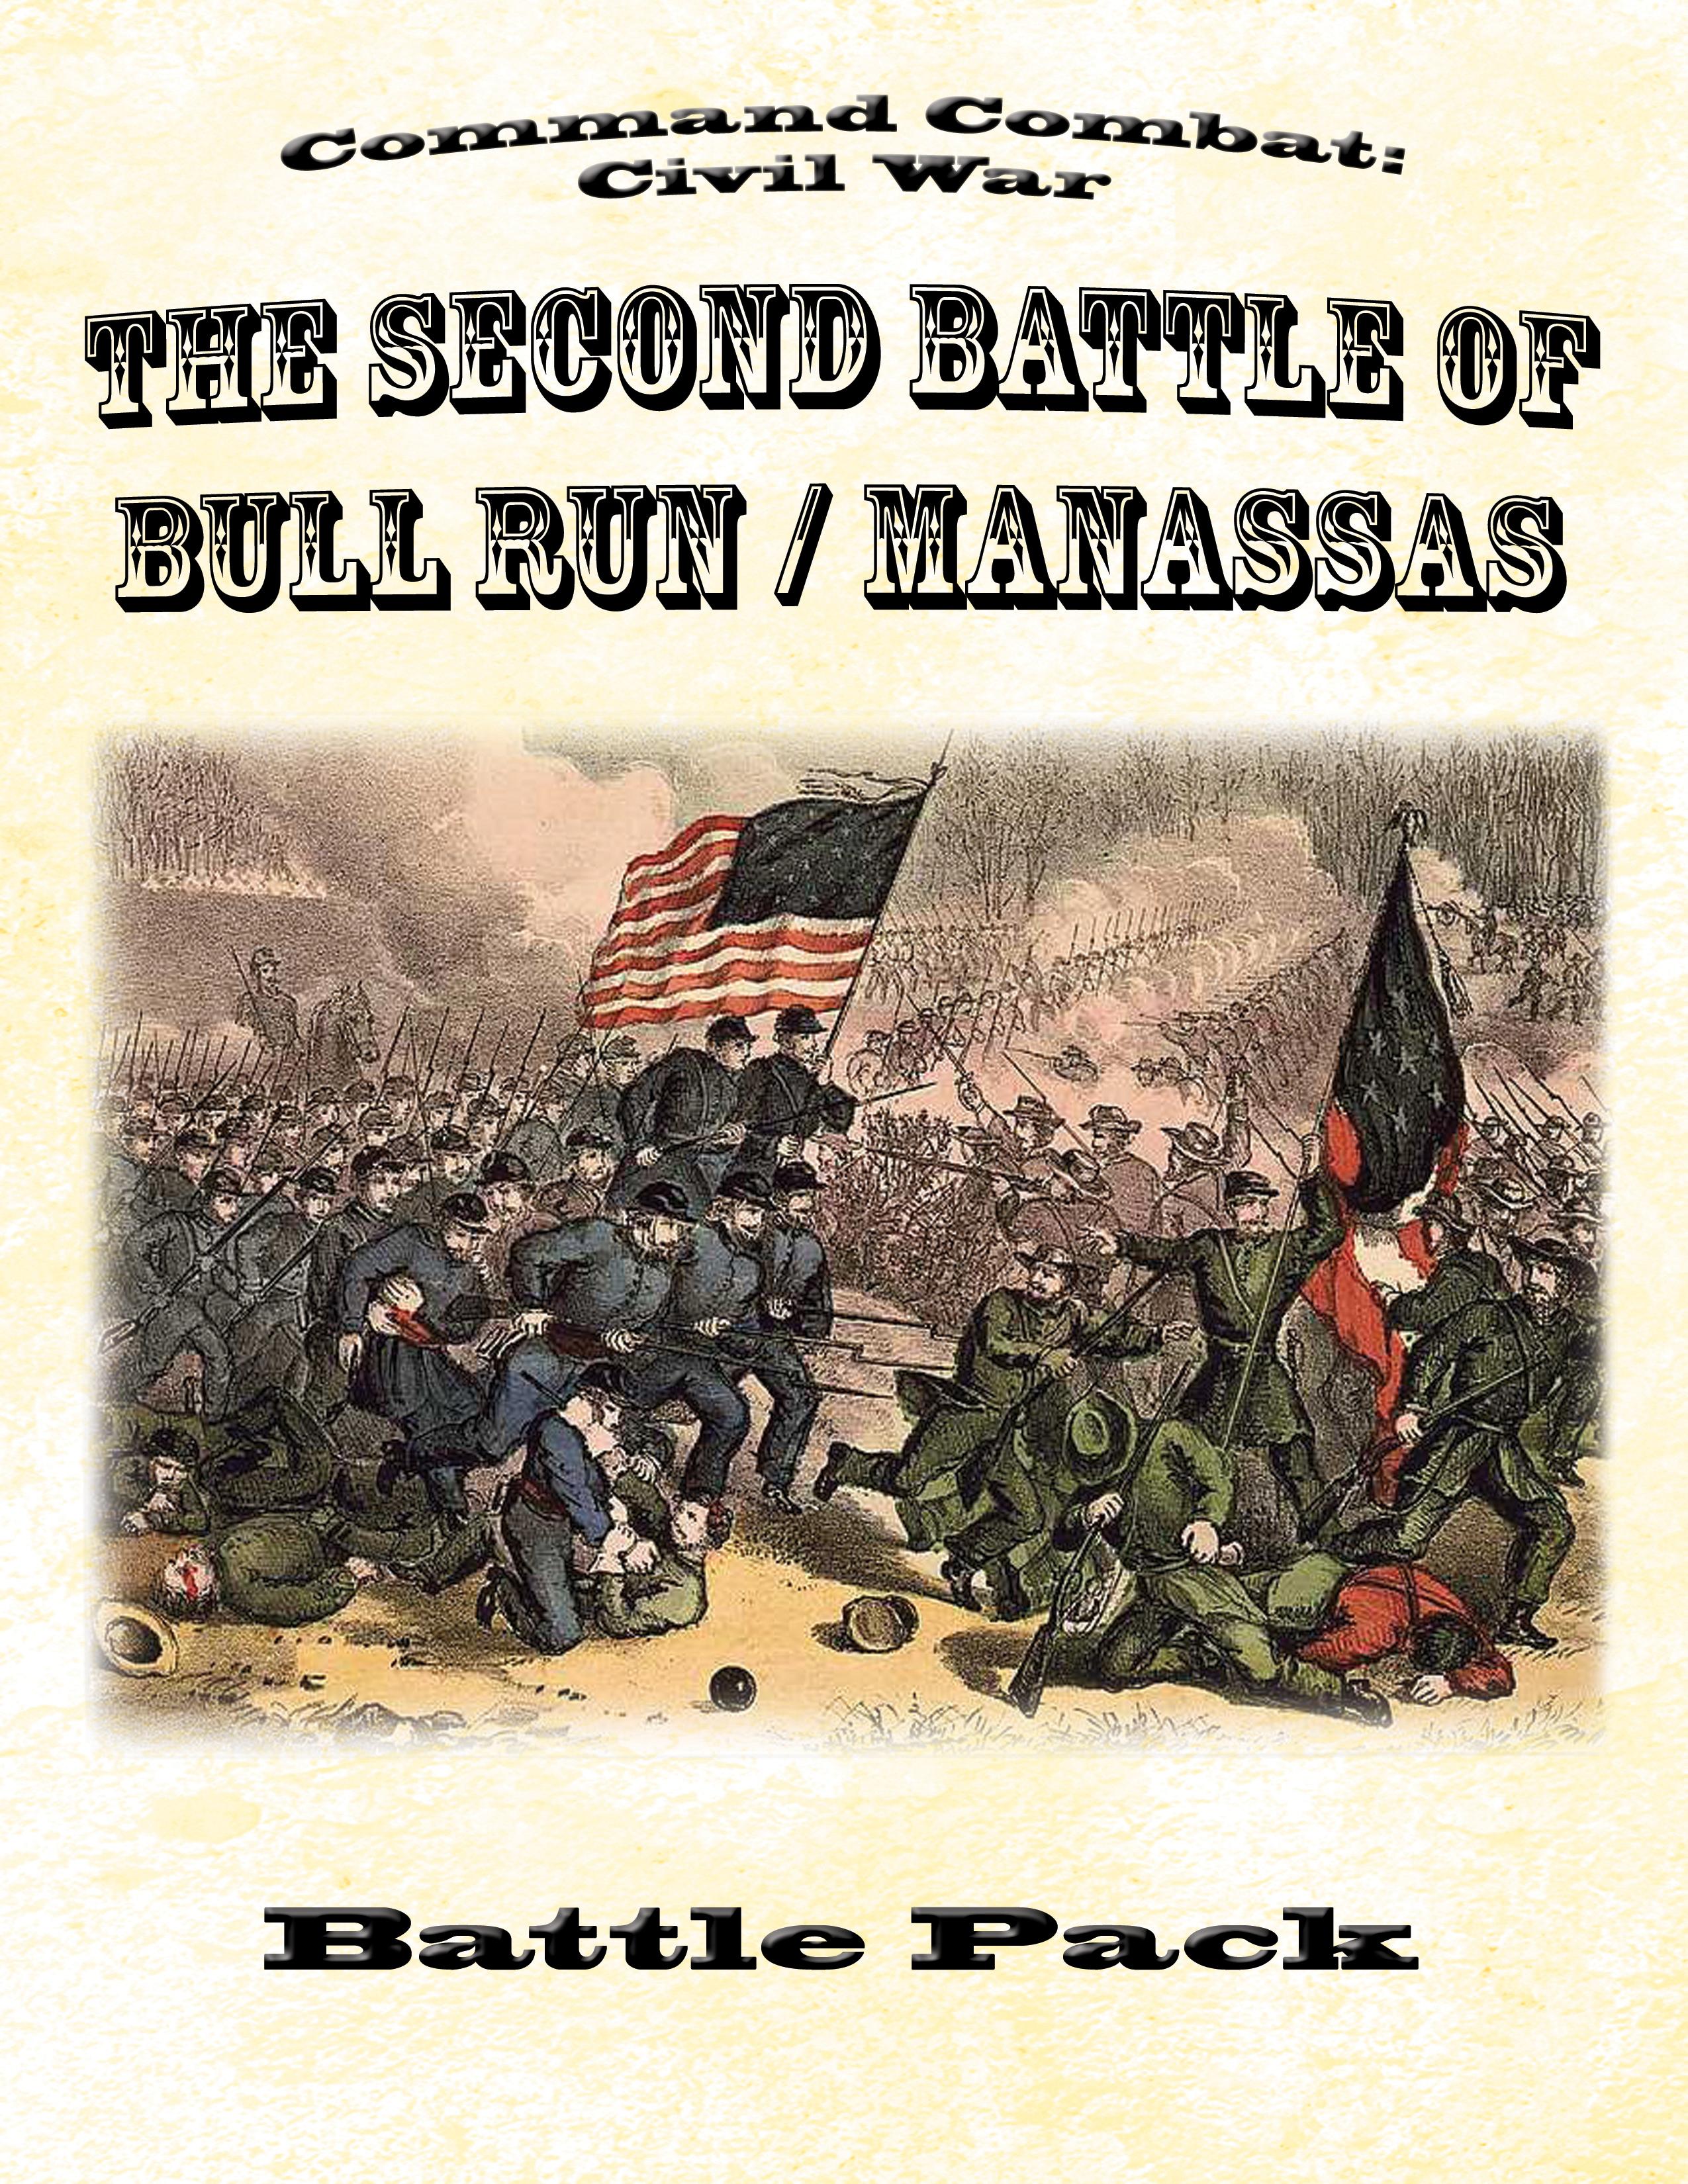 Battle clipart bull run. Books